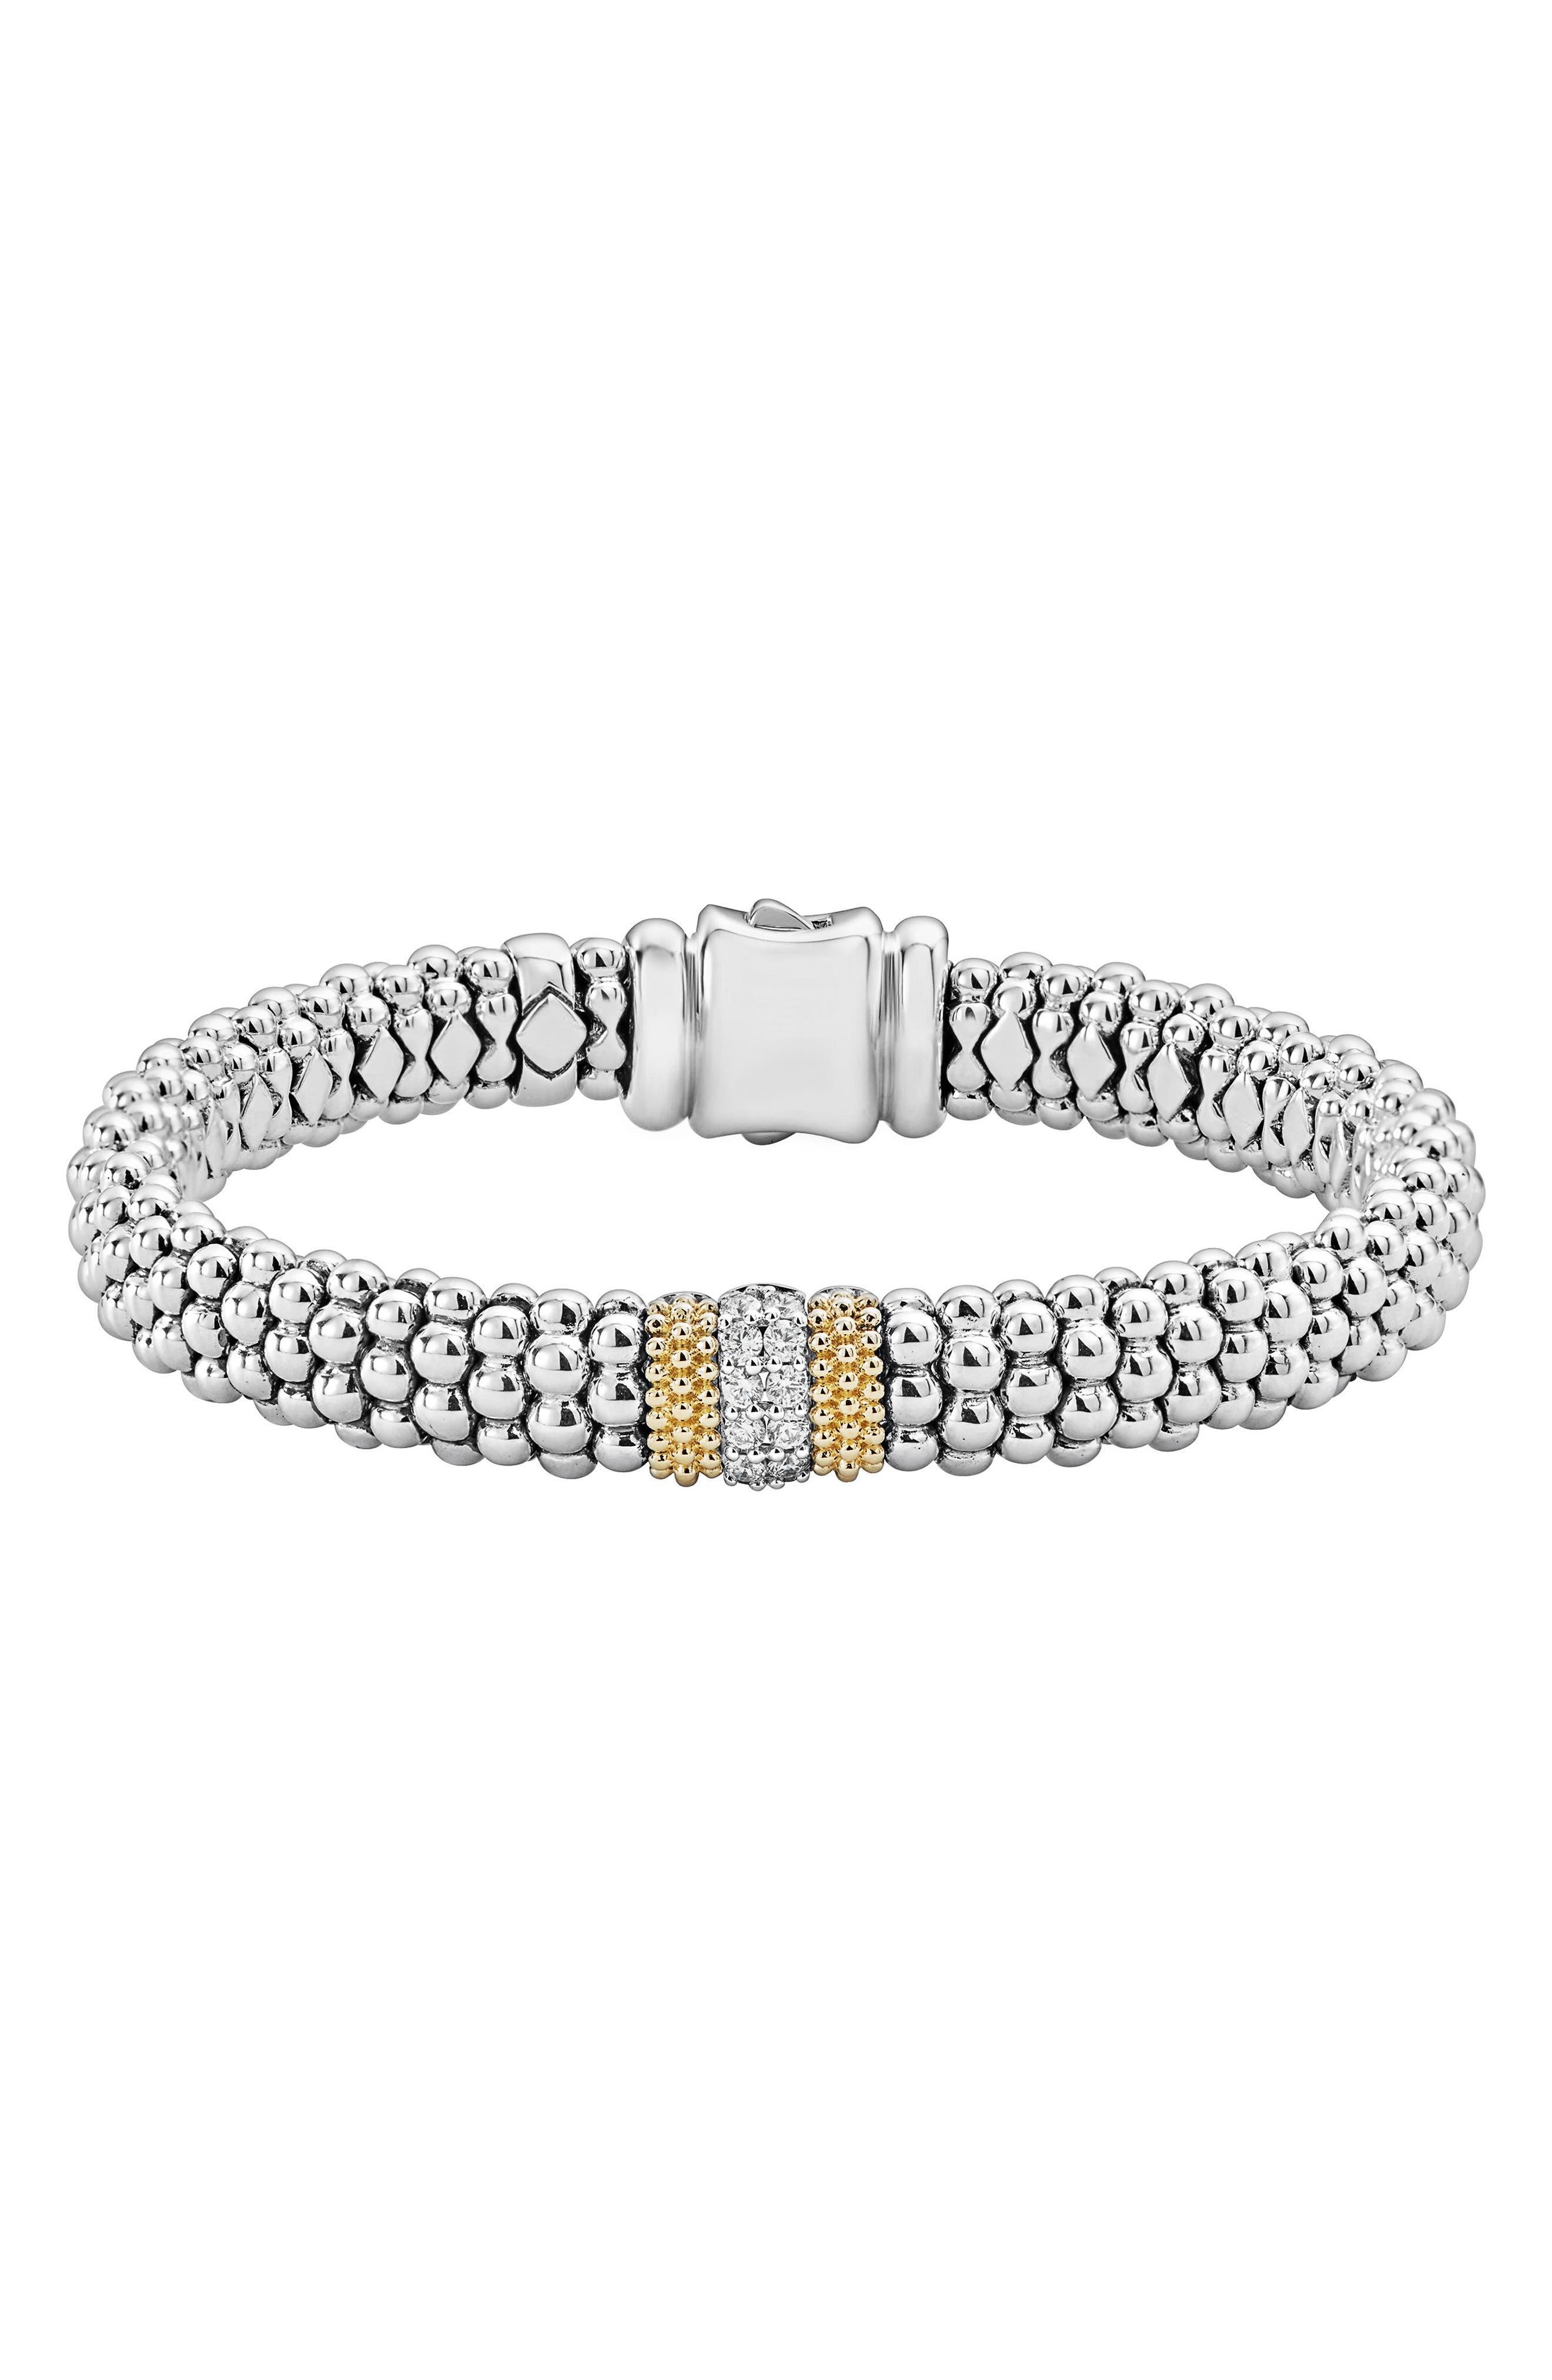 Luxe Pavé Diamond 9mm Bracelet,                             Main thumbnail 1, color,                             Diamond